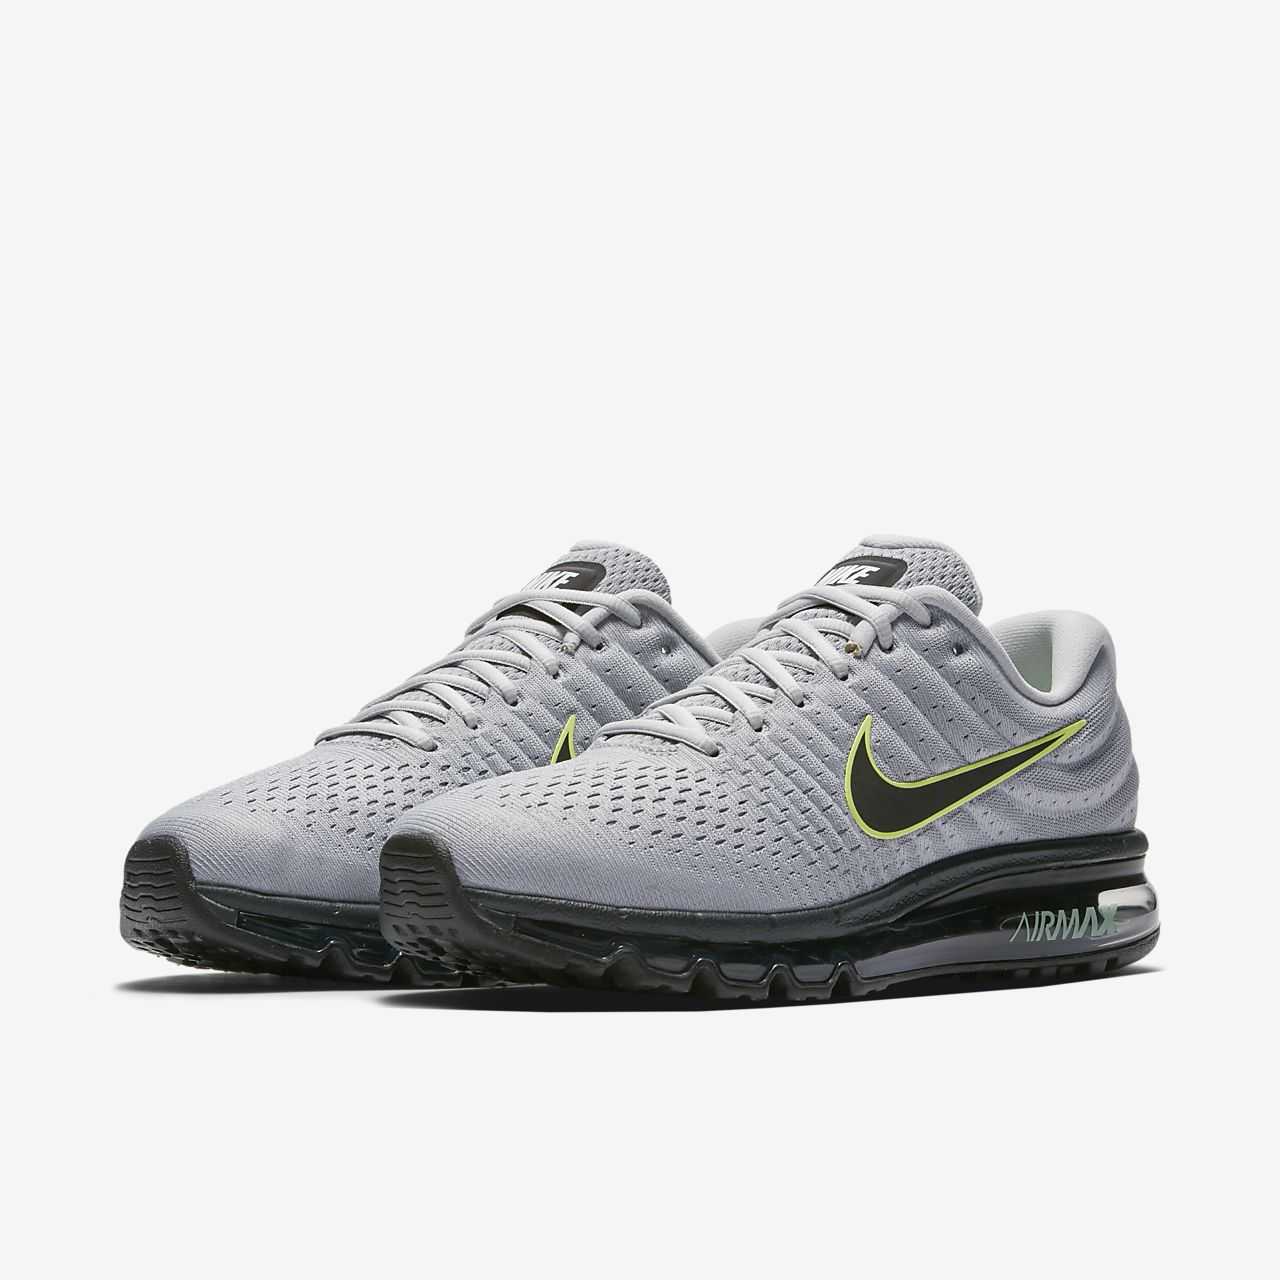 0eaff528 Мужские кроссовки Nike Air Max 2017. Nike.com RU